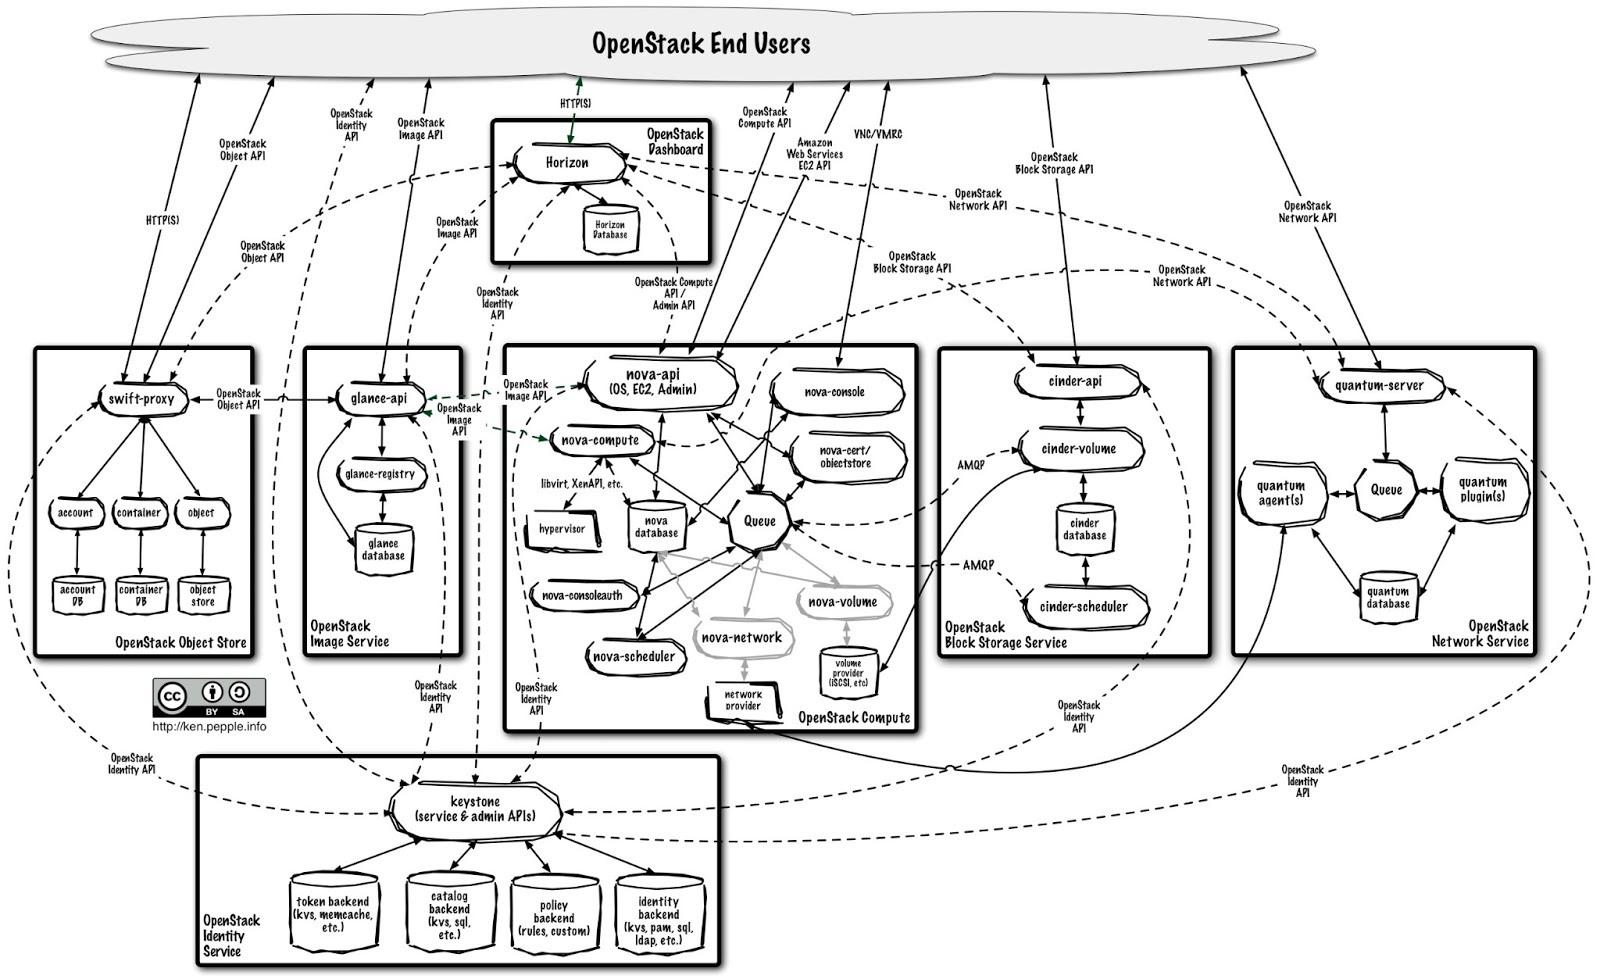 Linux Administration: Installing OpenStack Folsom on Ubuntu